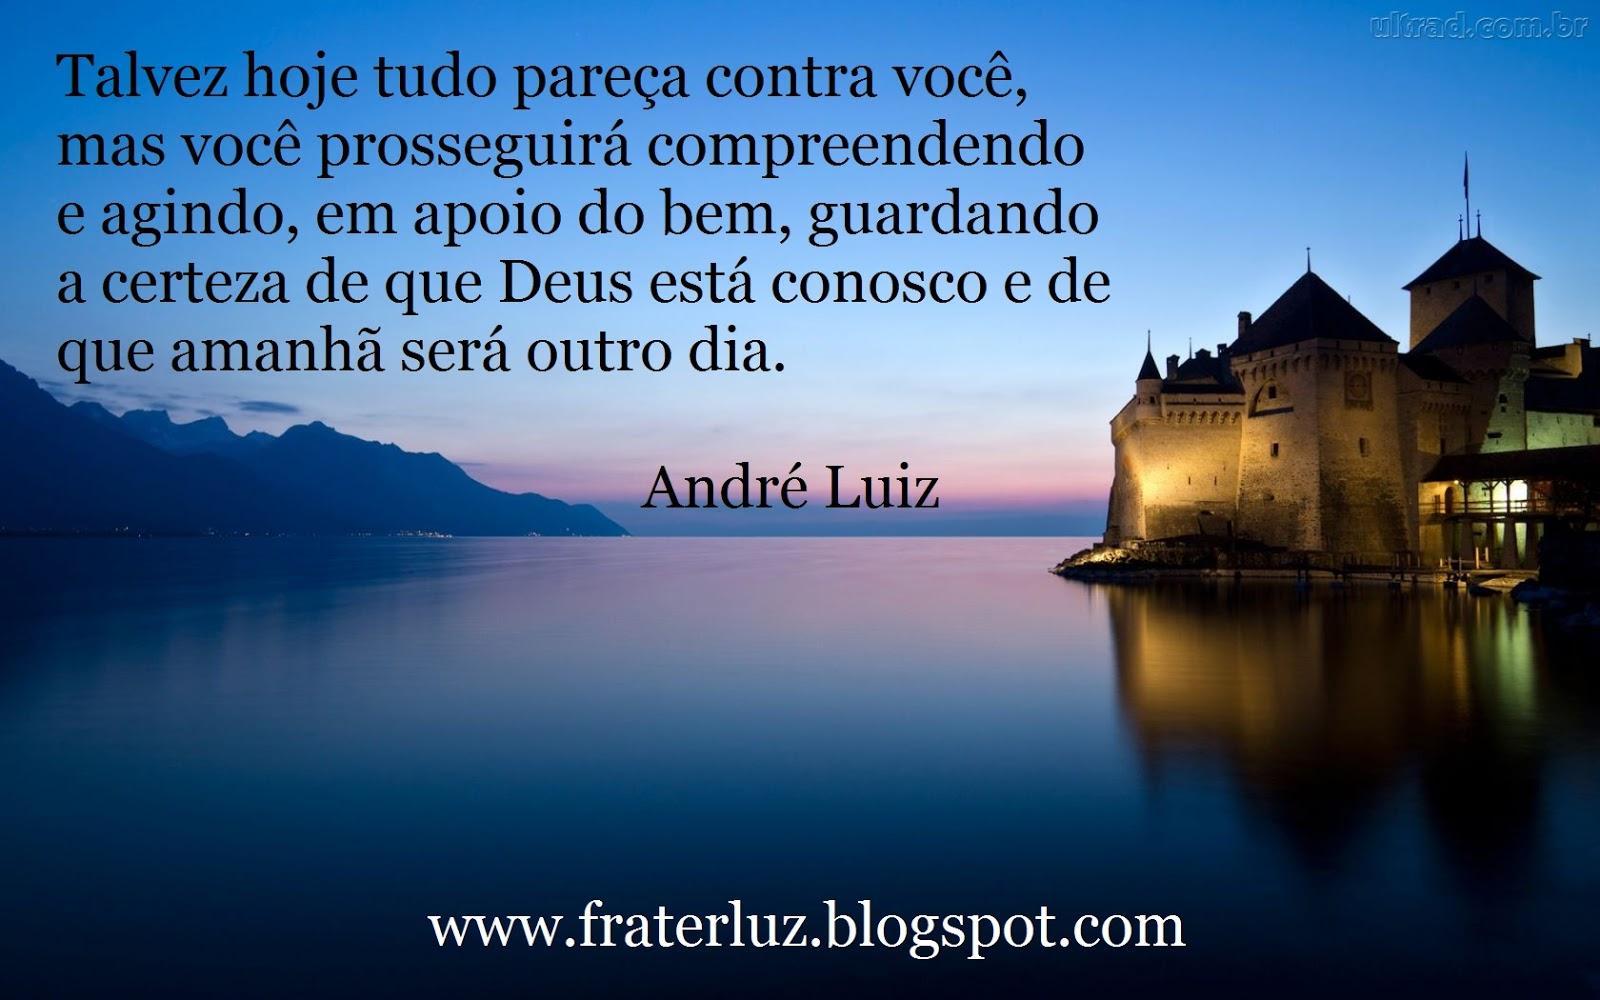 Mensagem Espírita De Otimismo: FRATERLUZ: Otimismo Sempre (André Luiz